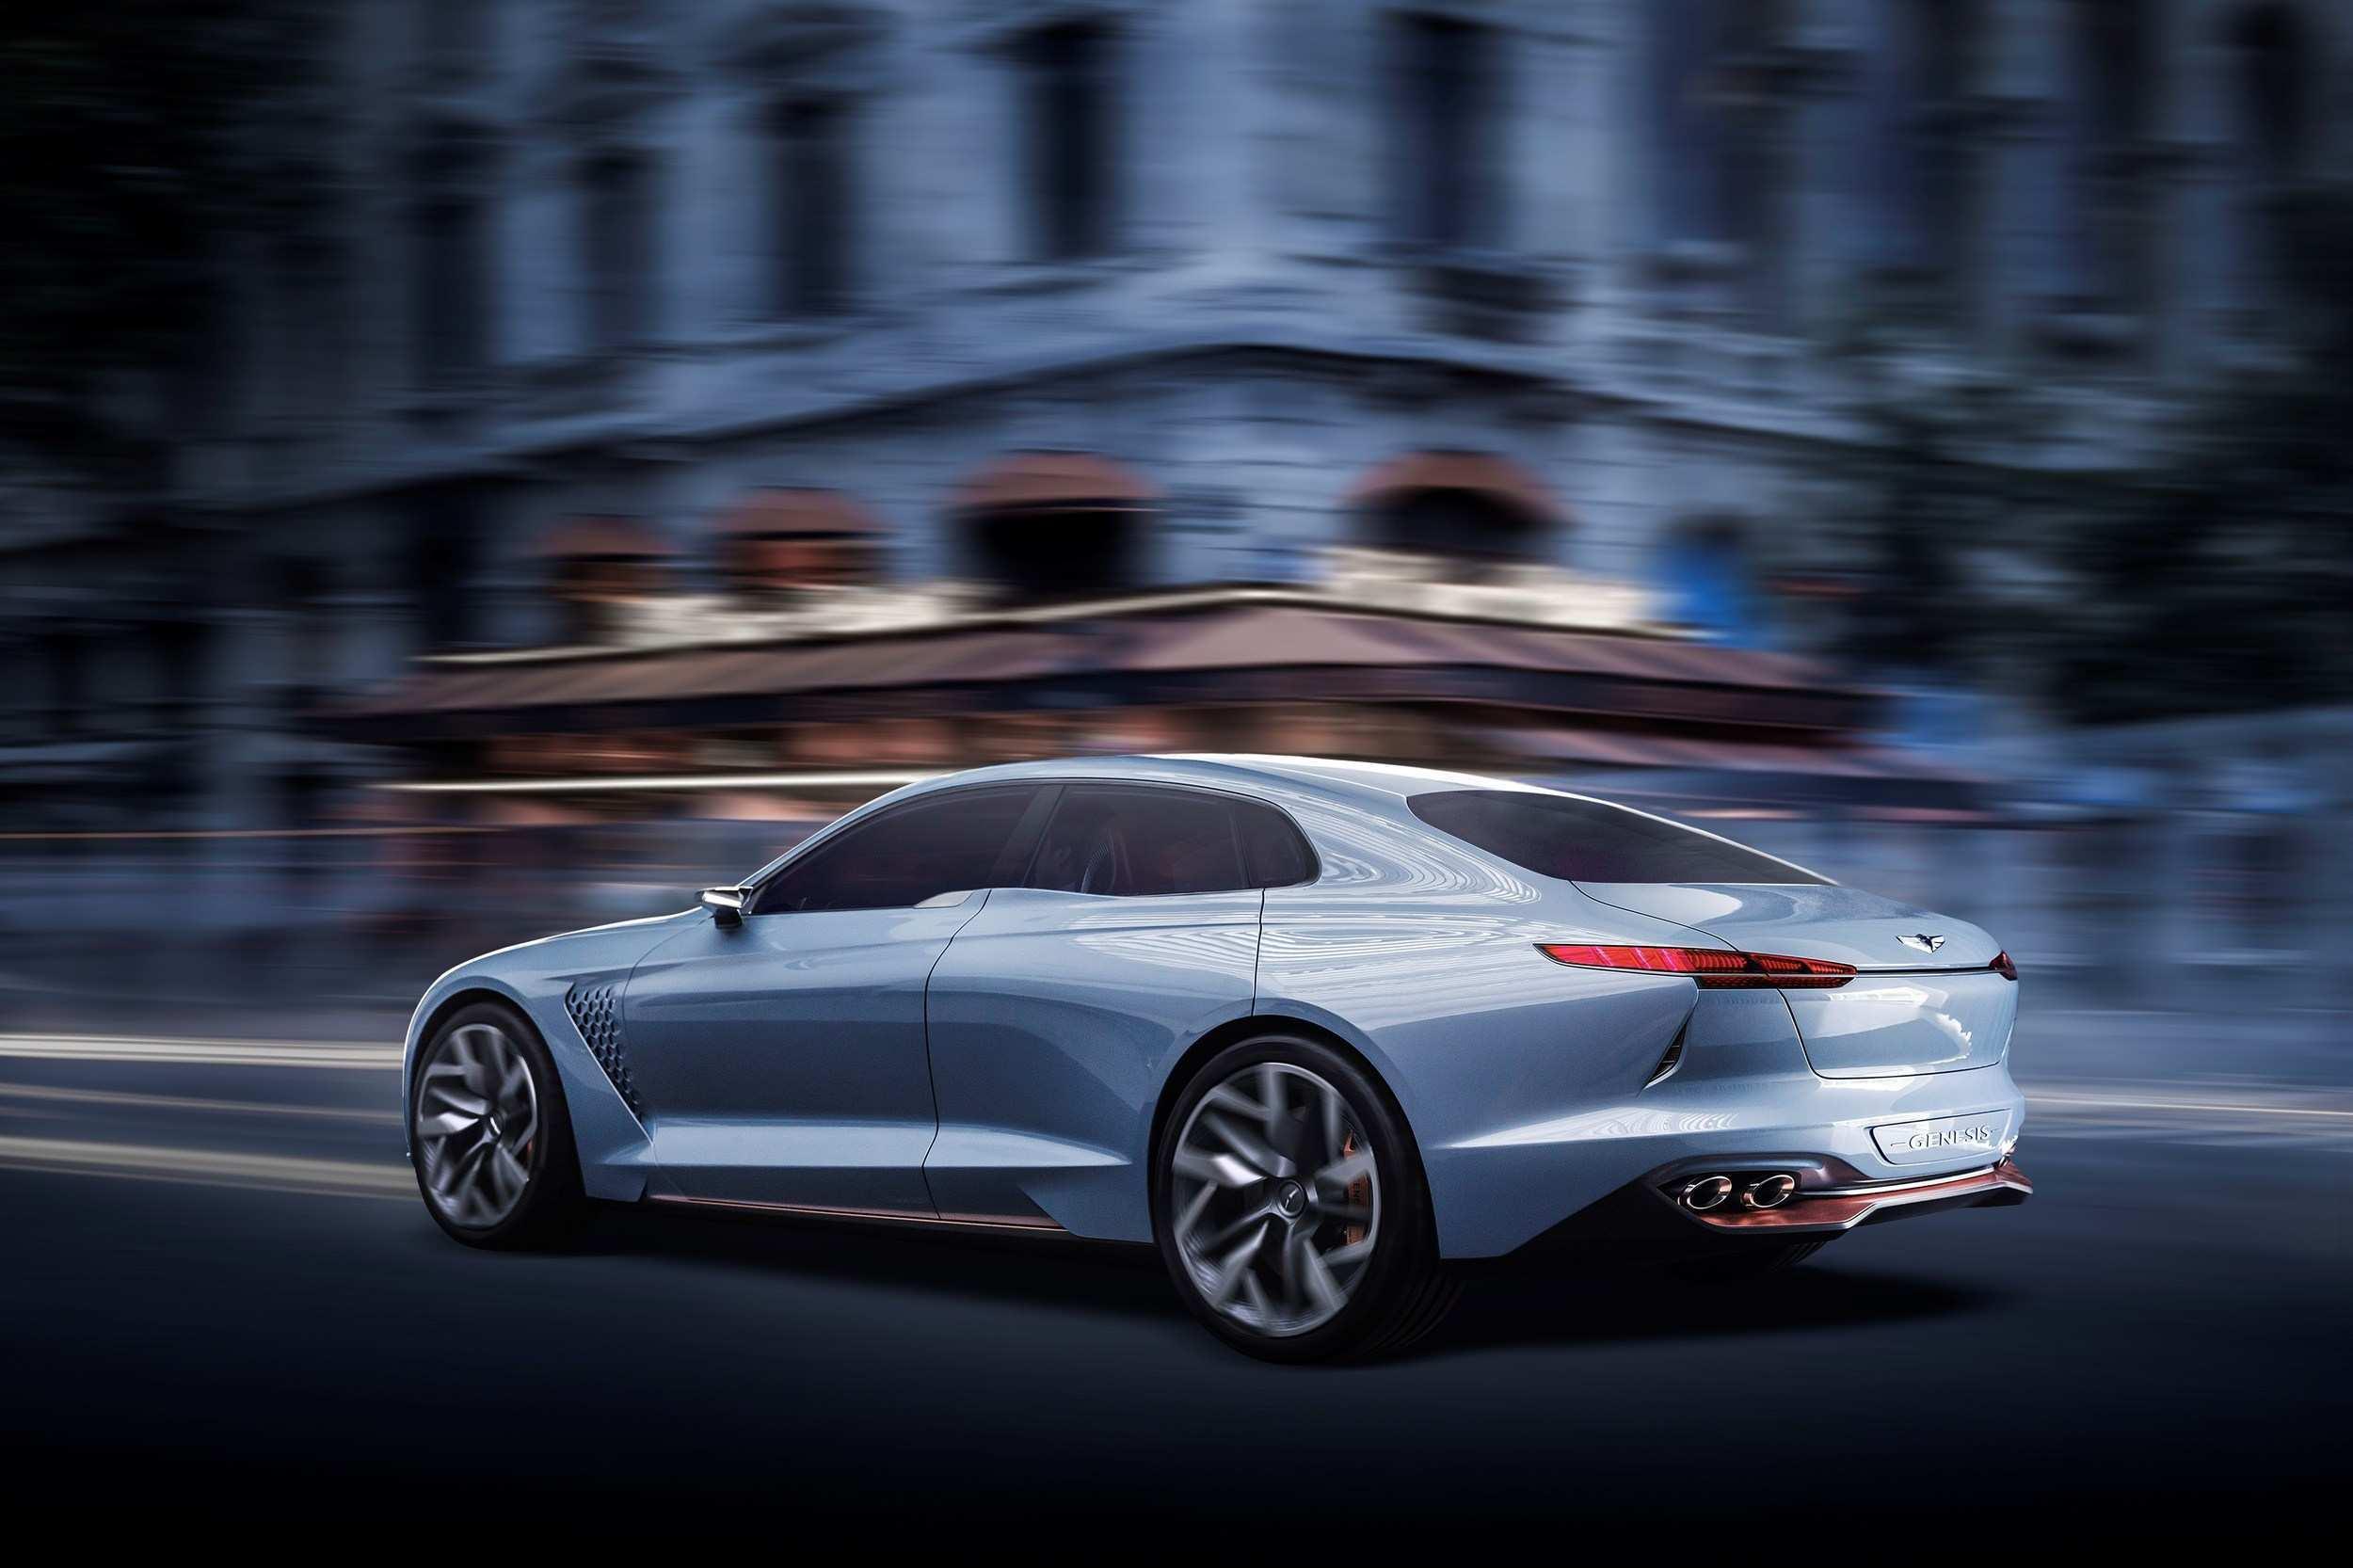 66 Concept of Genesis Car 2020 Exterior for Genesis Car 2020